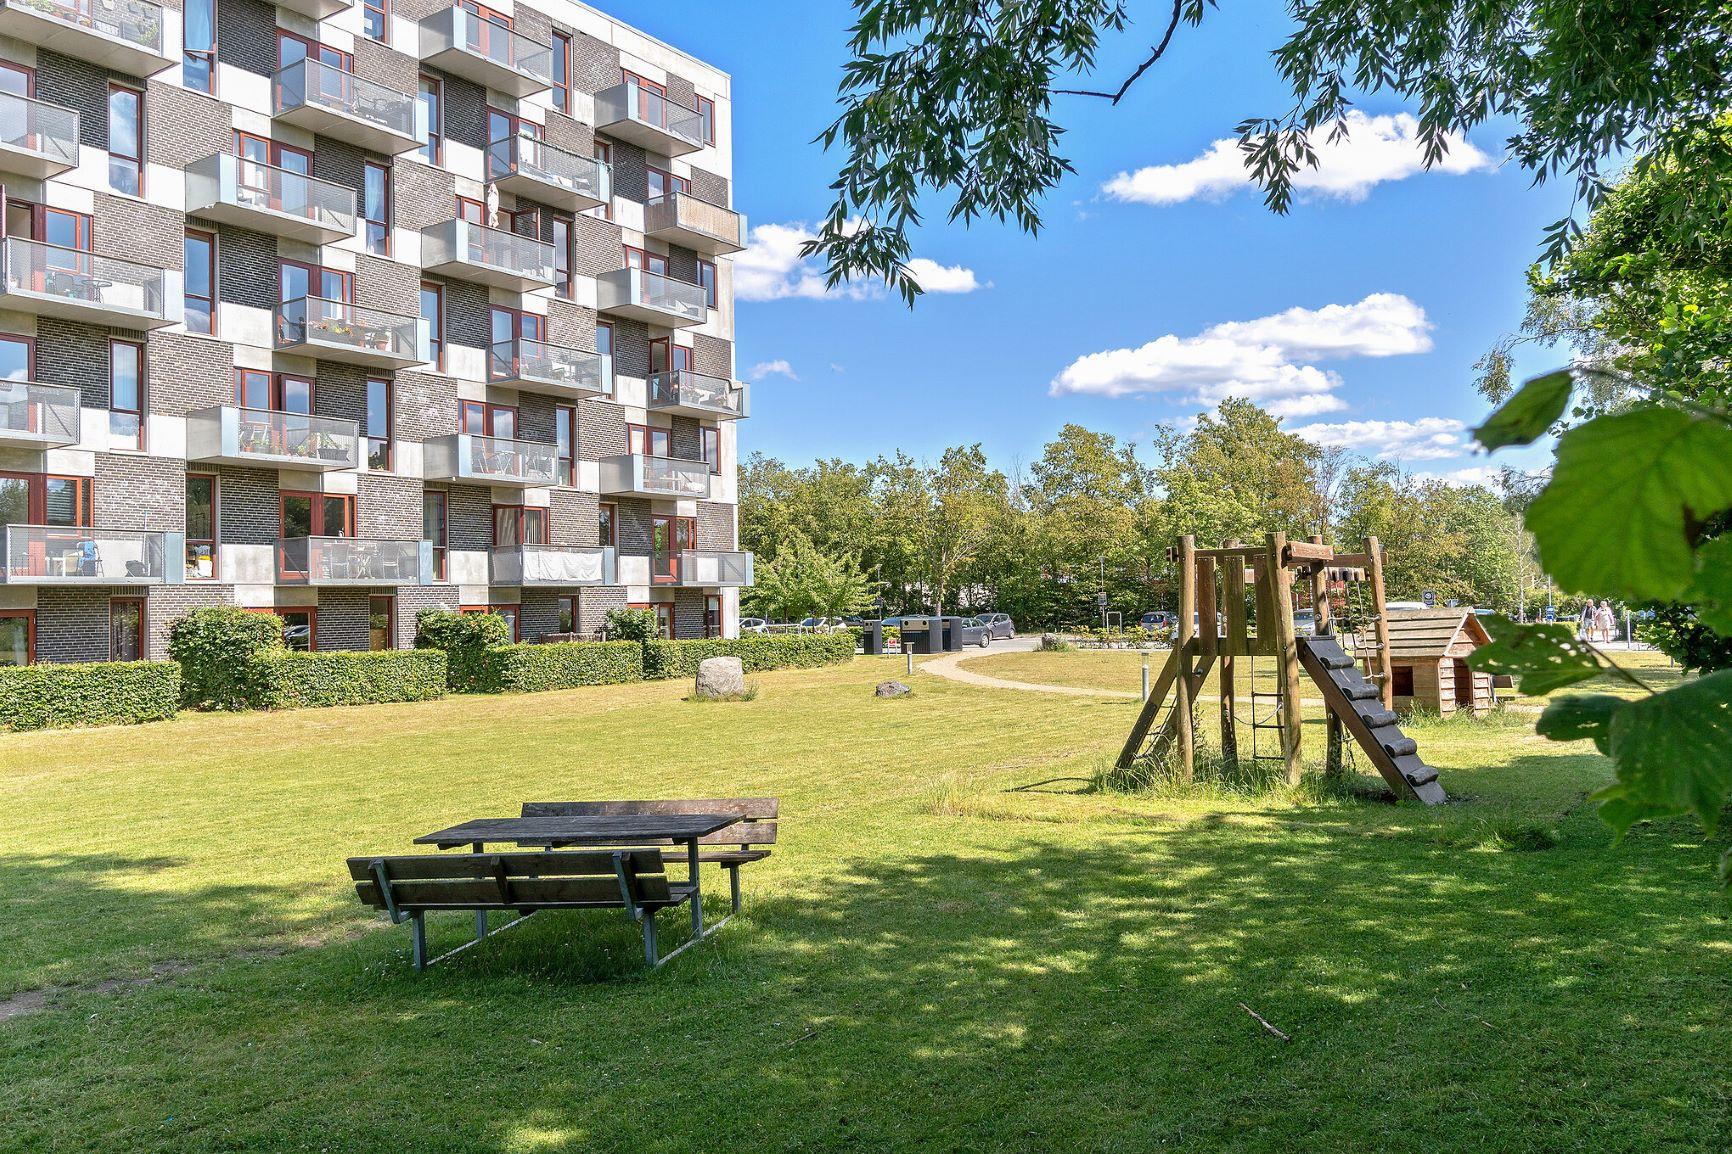 Lejebolig på Gyngemose Parkvej 51, 1. th., 2860 Søborg